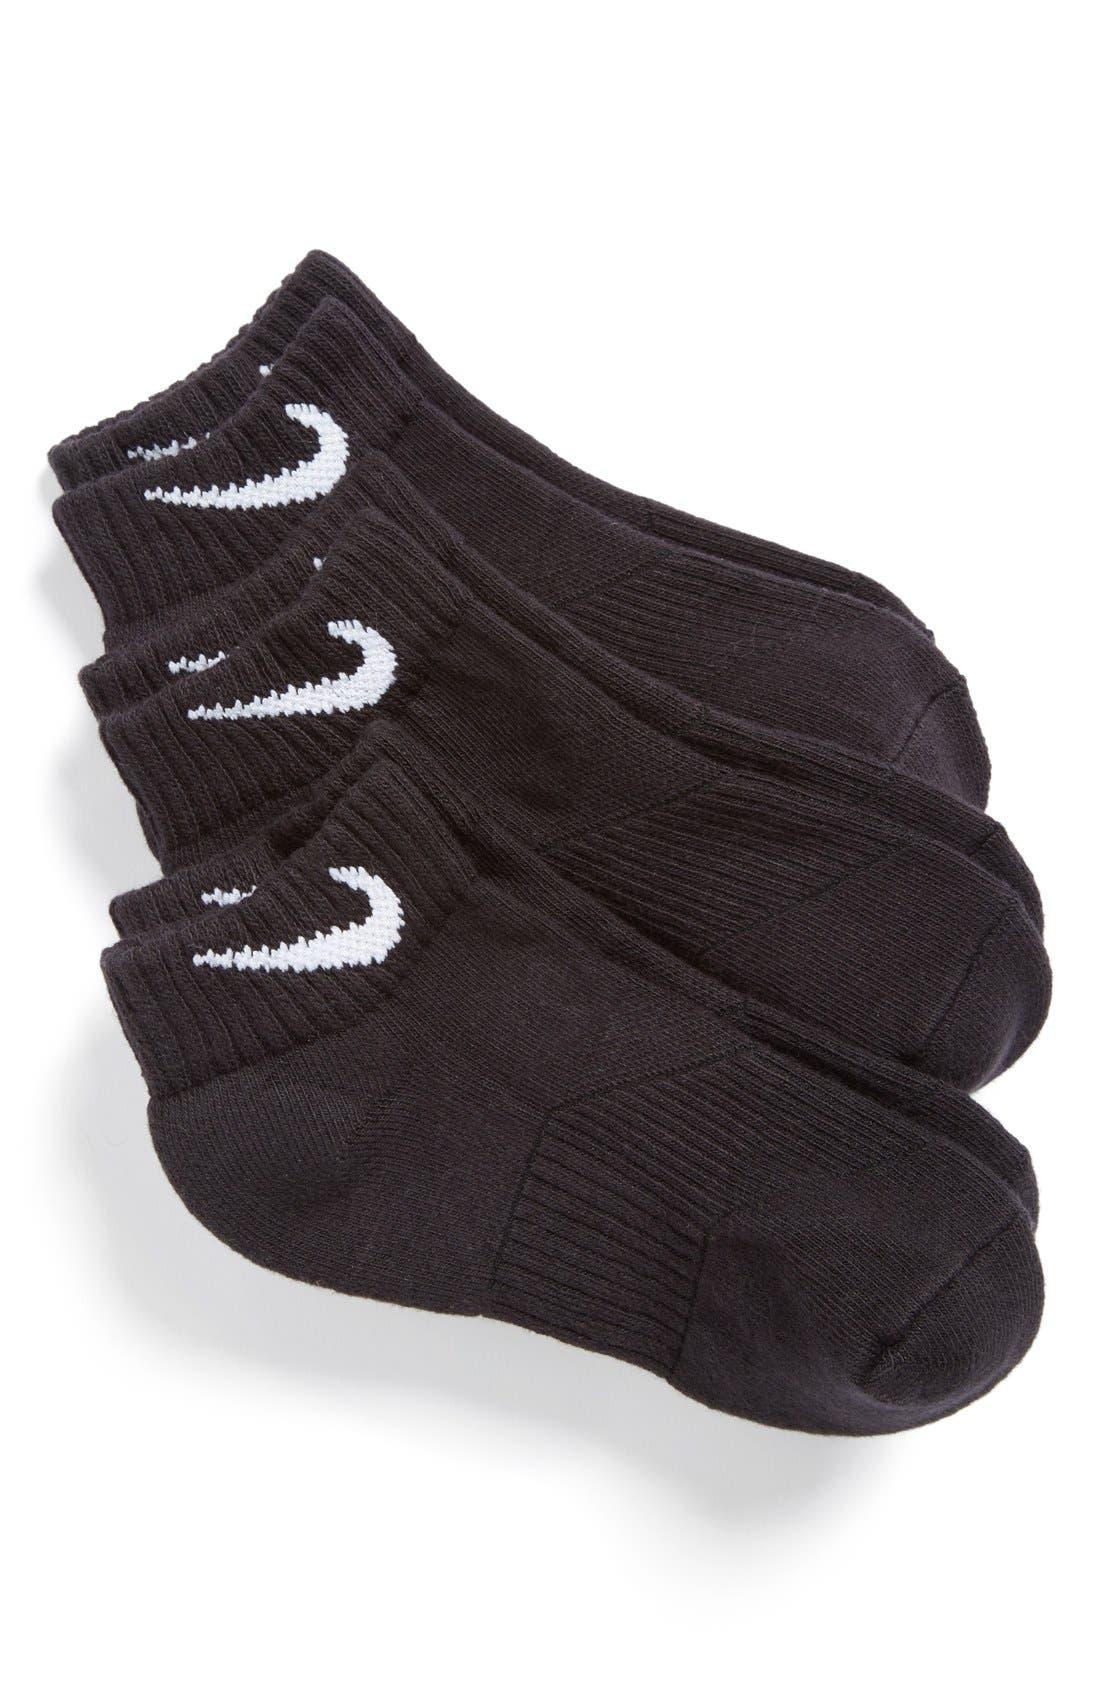 3-Pack Cushioned Low Cut Socks,                             Main thumbnail 3, color,